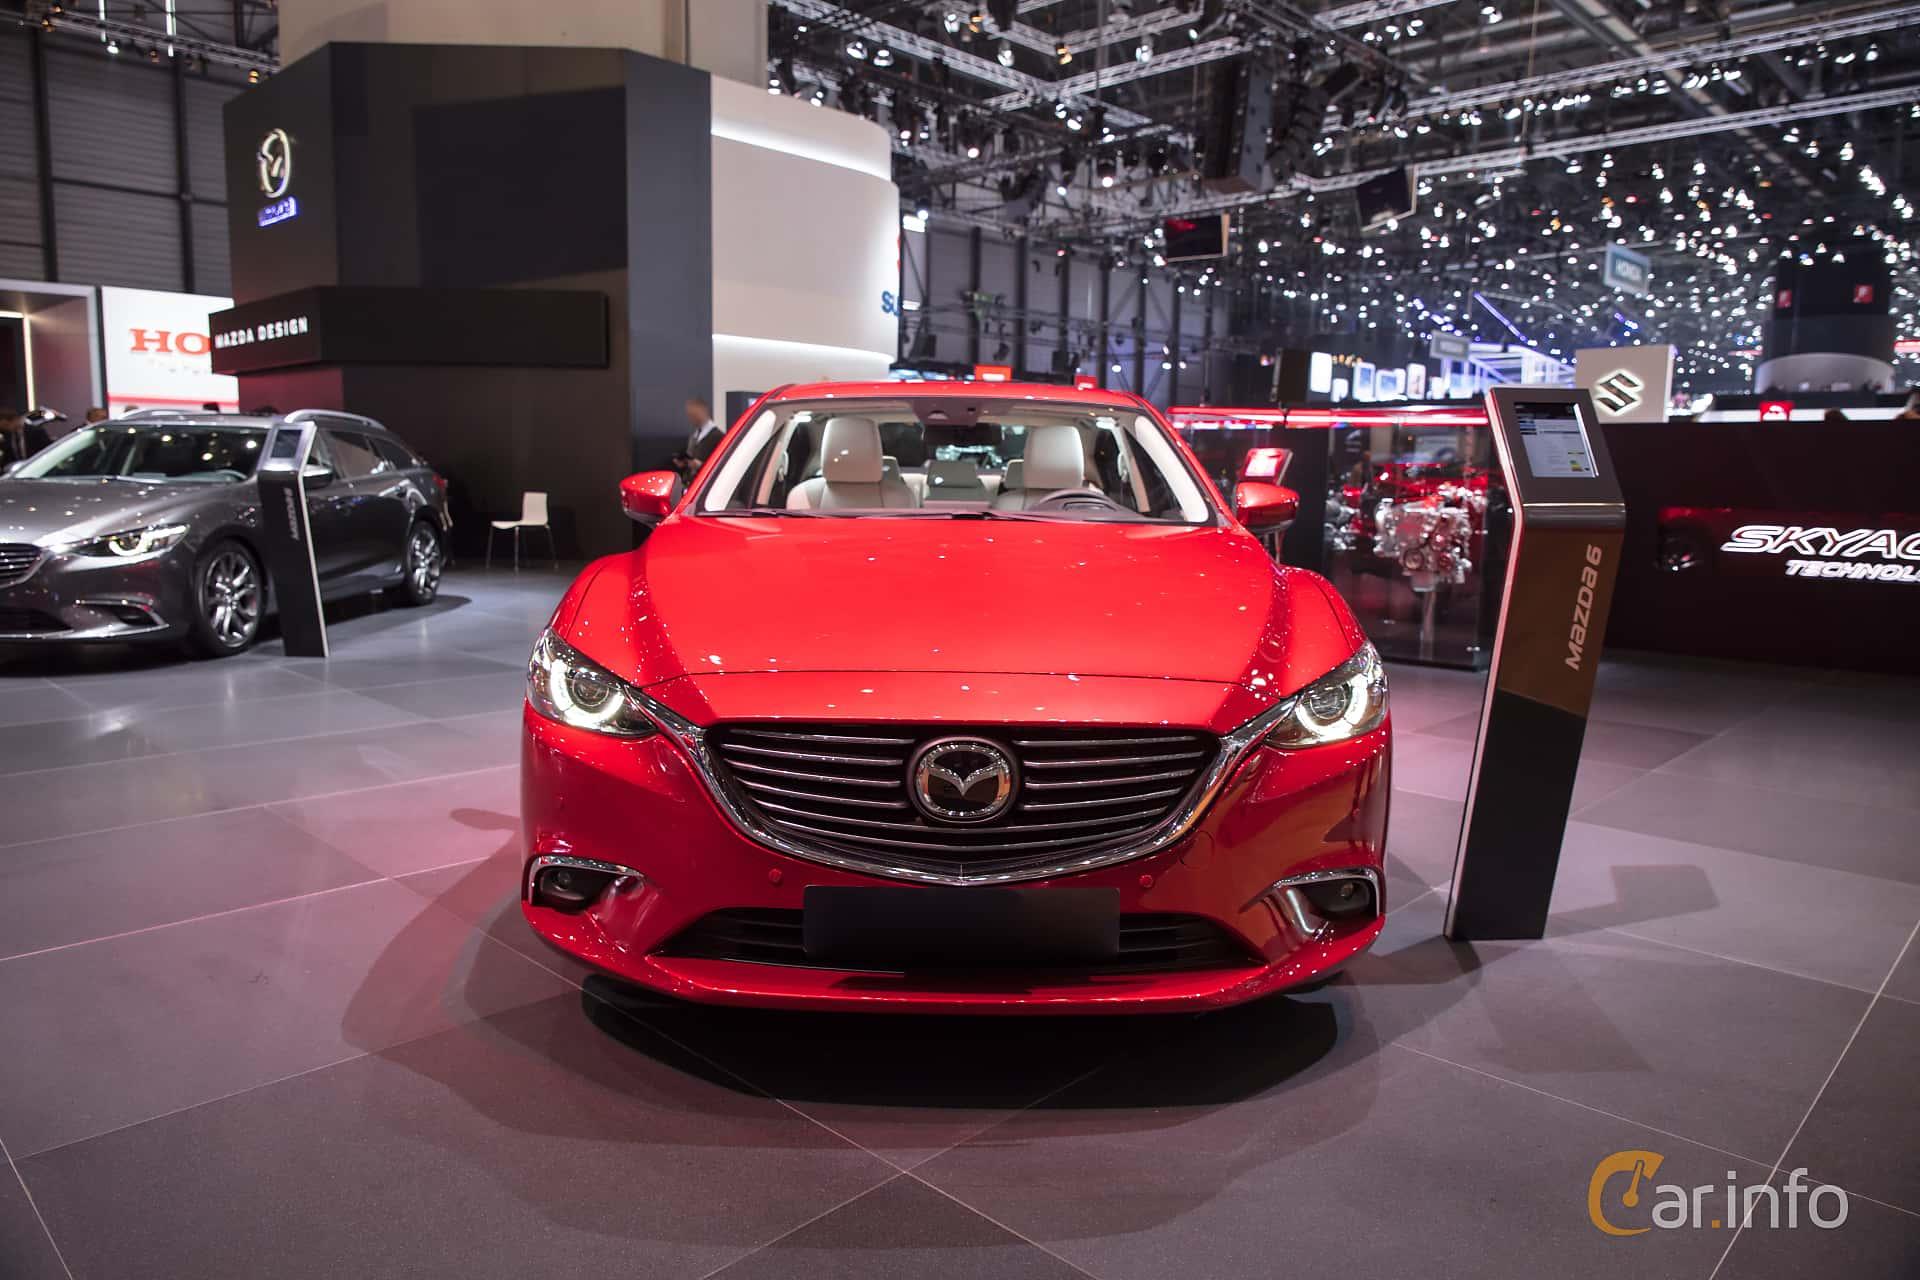 Front  of Mazda 6 Sedan 2.5 SKYACTIV-G Automatic, 192ps, 2017 at Geneva Motor Show 2017